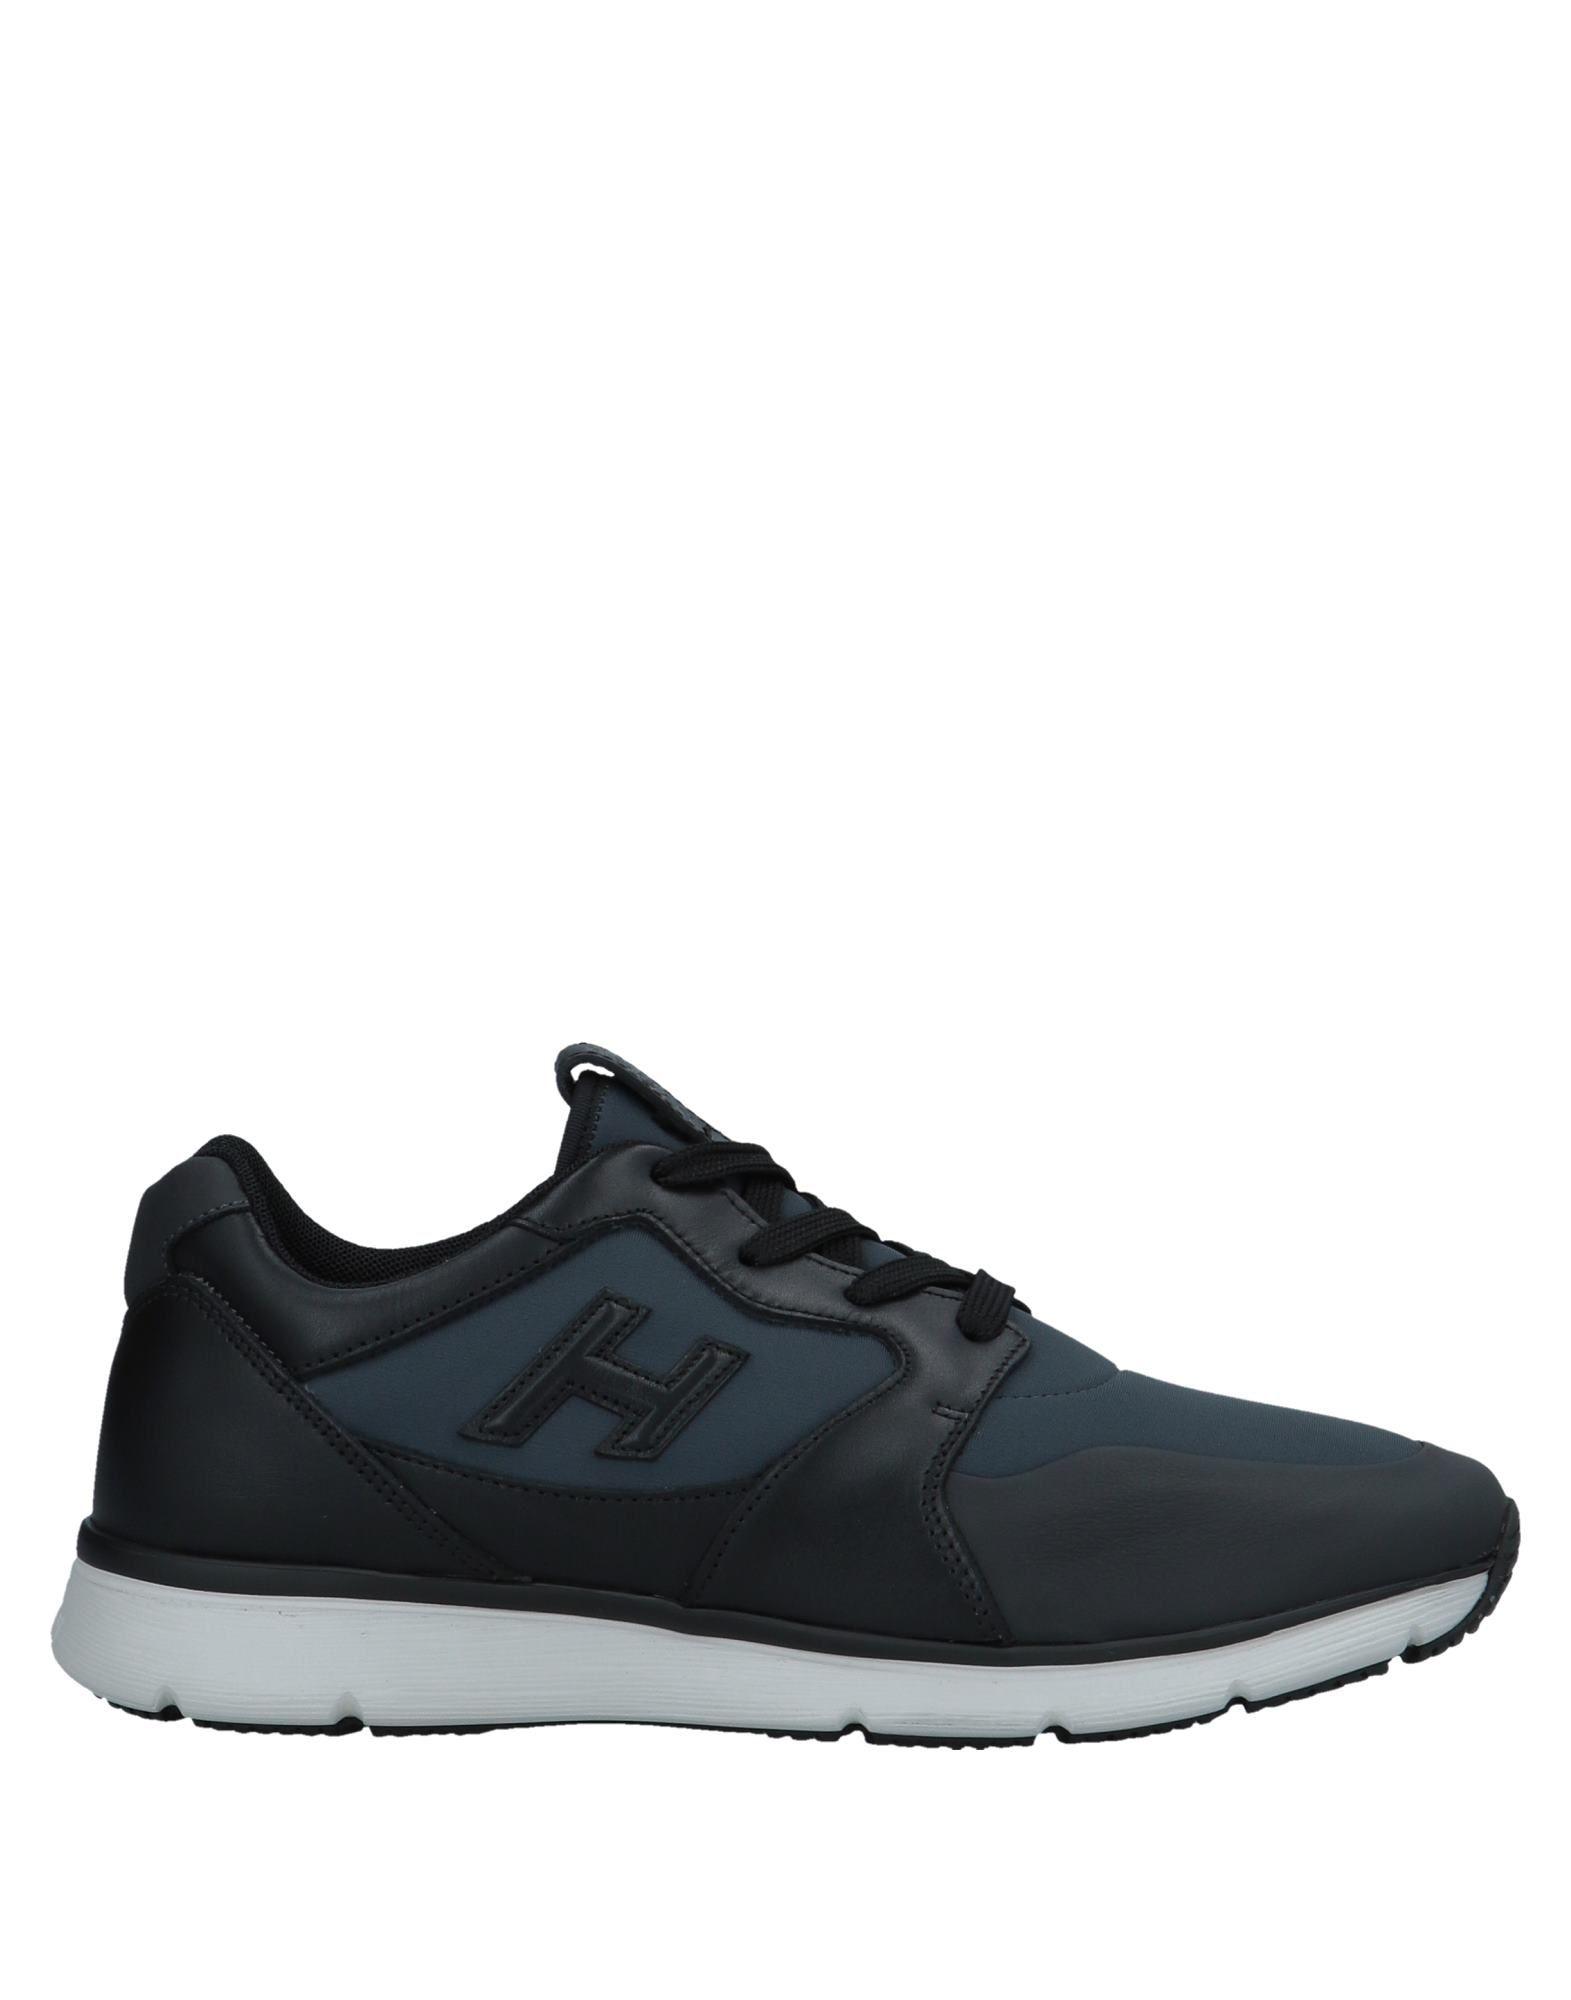 Hogan Sneakers Herren  11540685JM Gute Qualität beliebte Schuhe